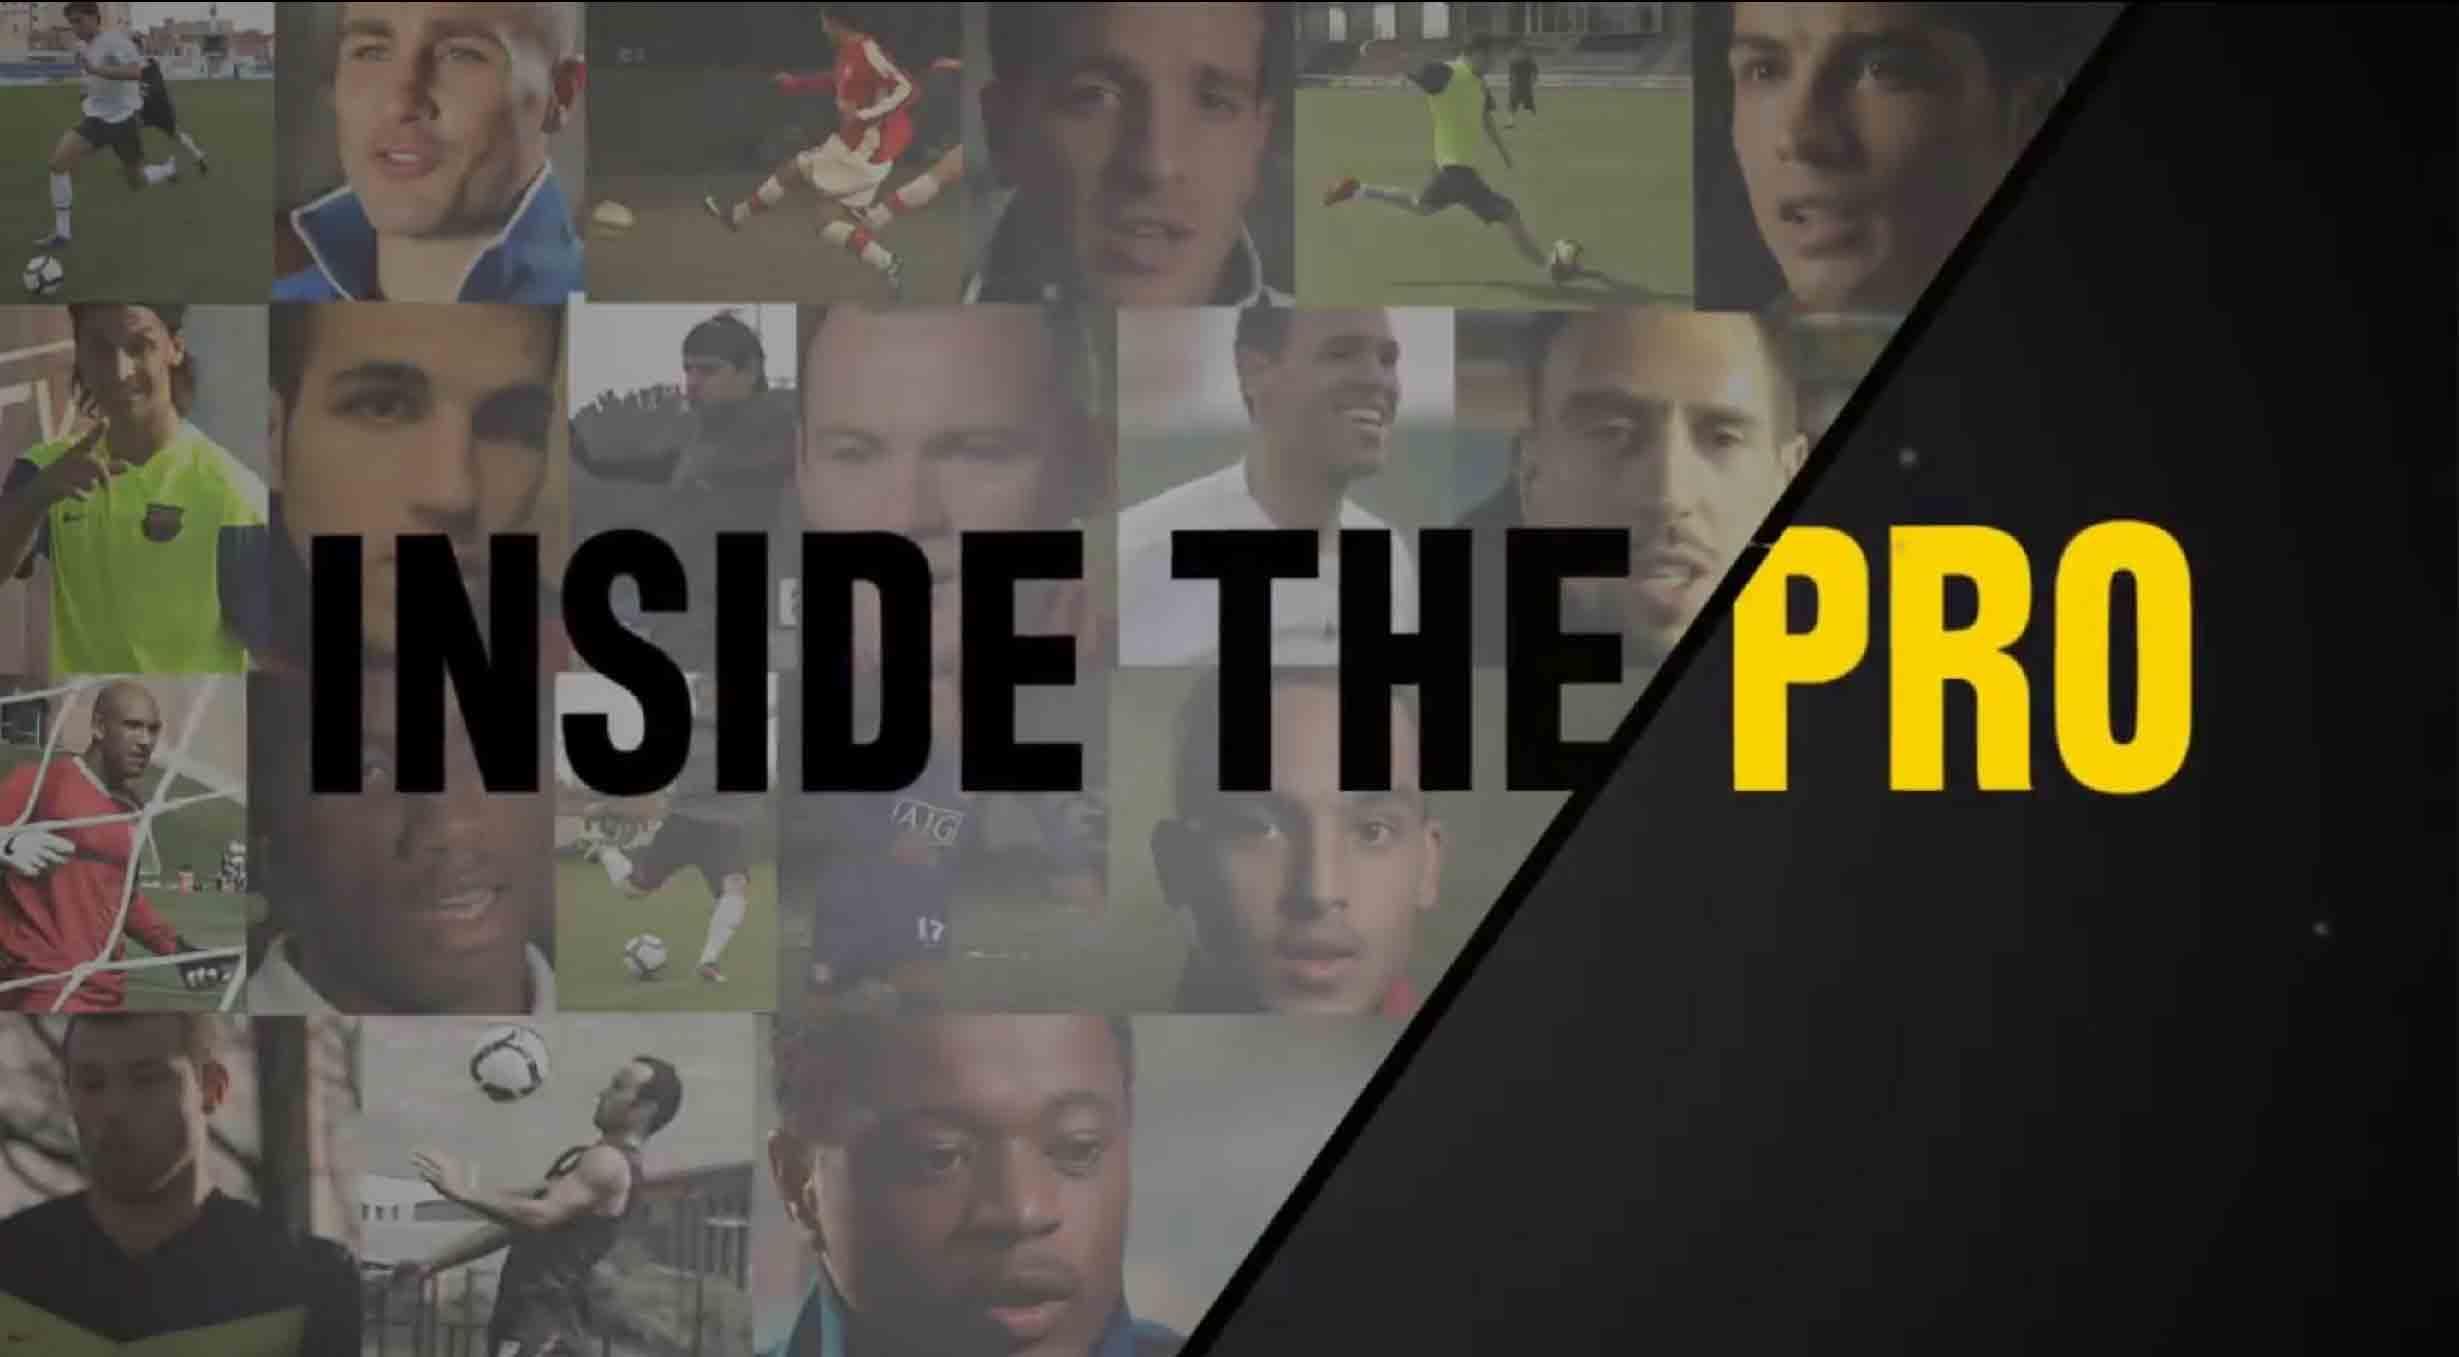 Inside the Pro